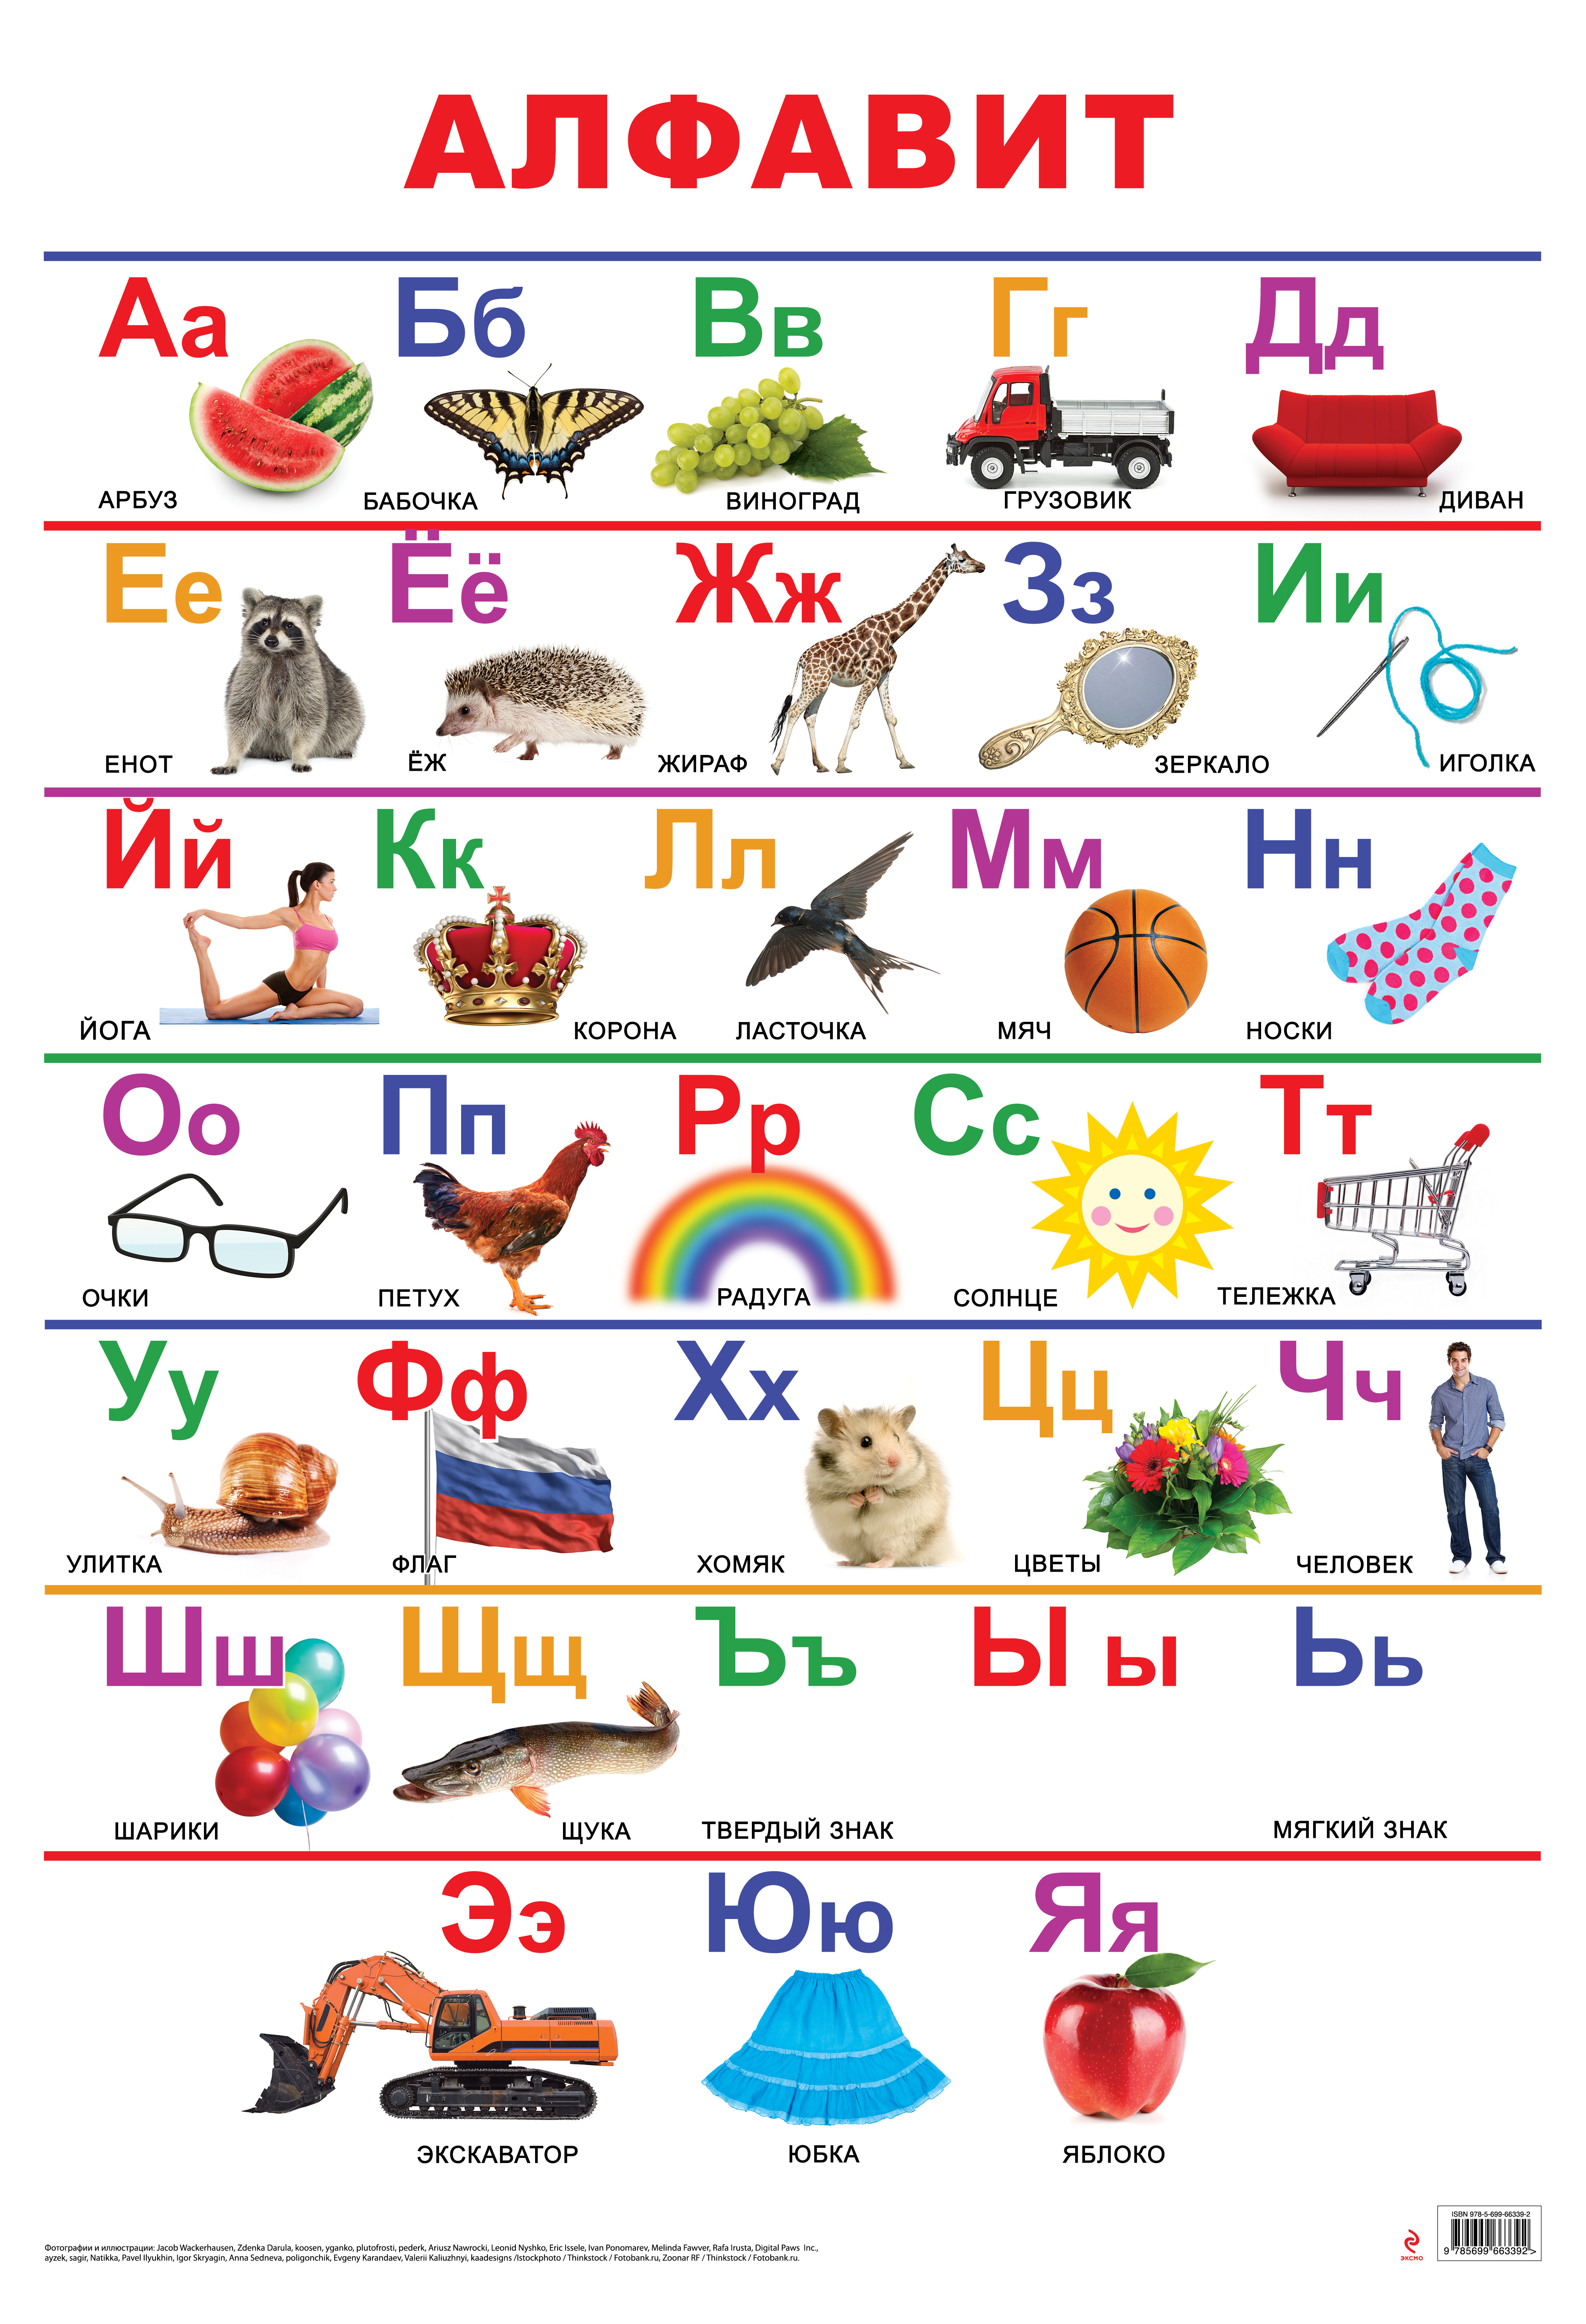 Алфавит (русский) от book24.ru